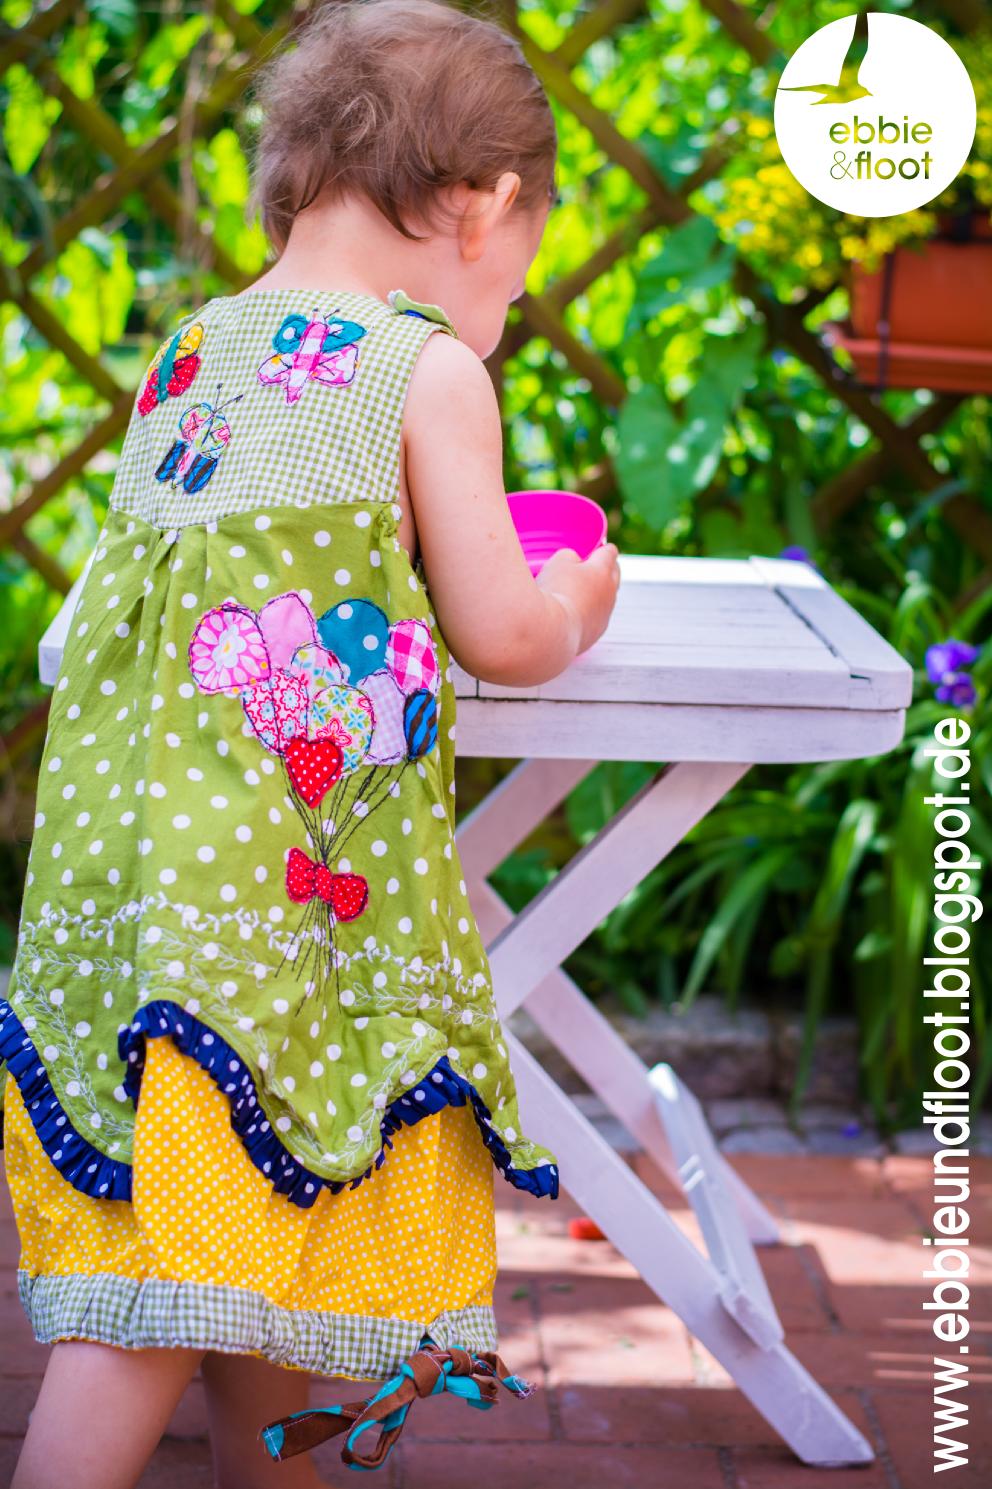 ebbie und floot_farbenmix_Cara_Kleid_Dress_birthday dress_Cake_Ballon_ribbons_ruffels_green_dots_02